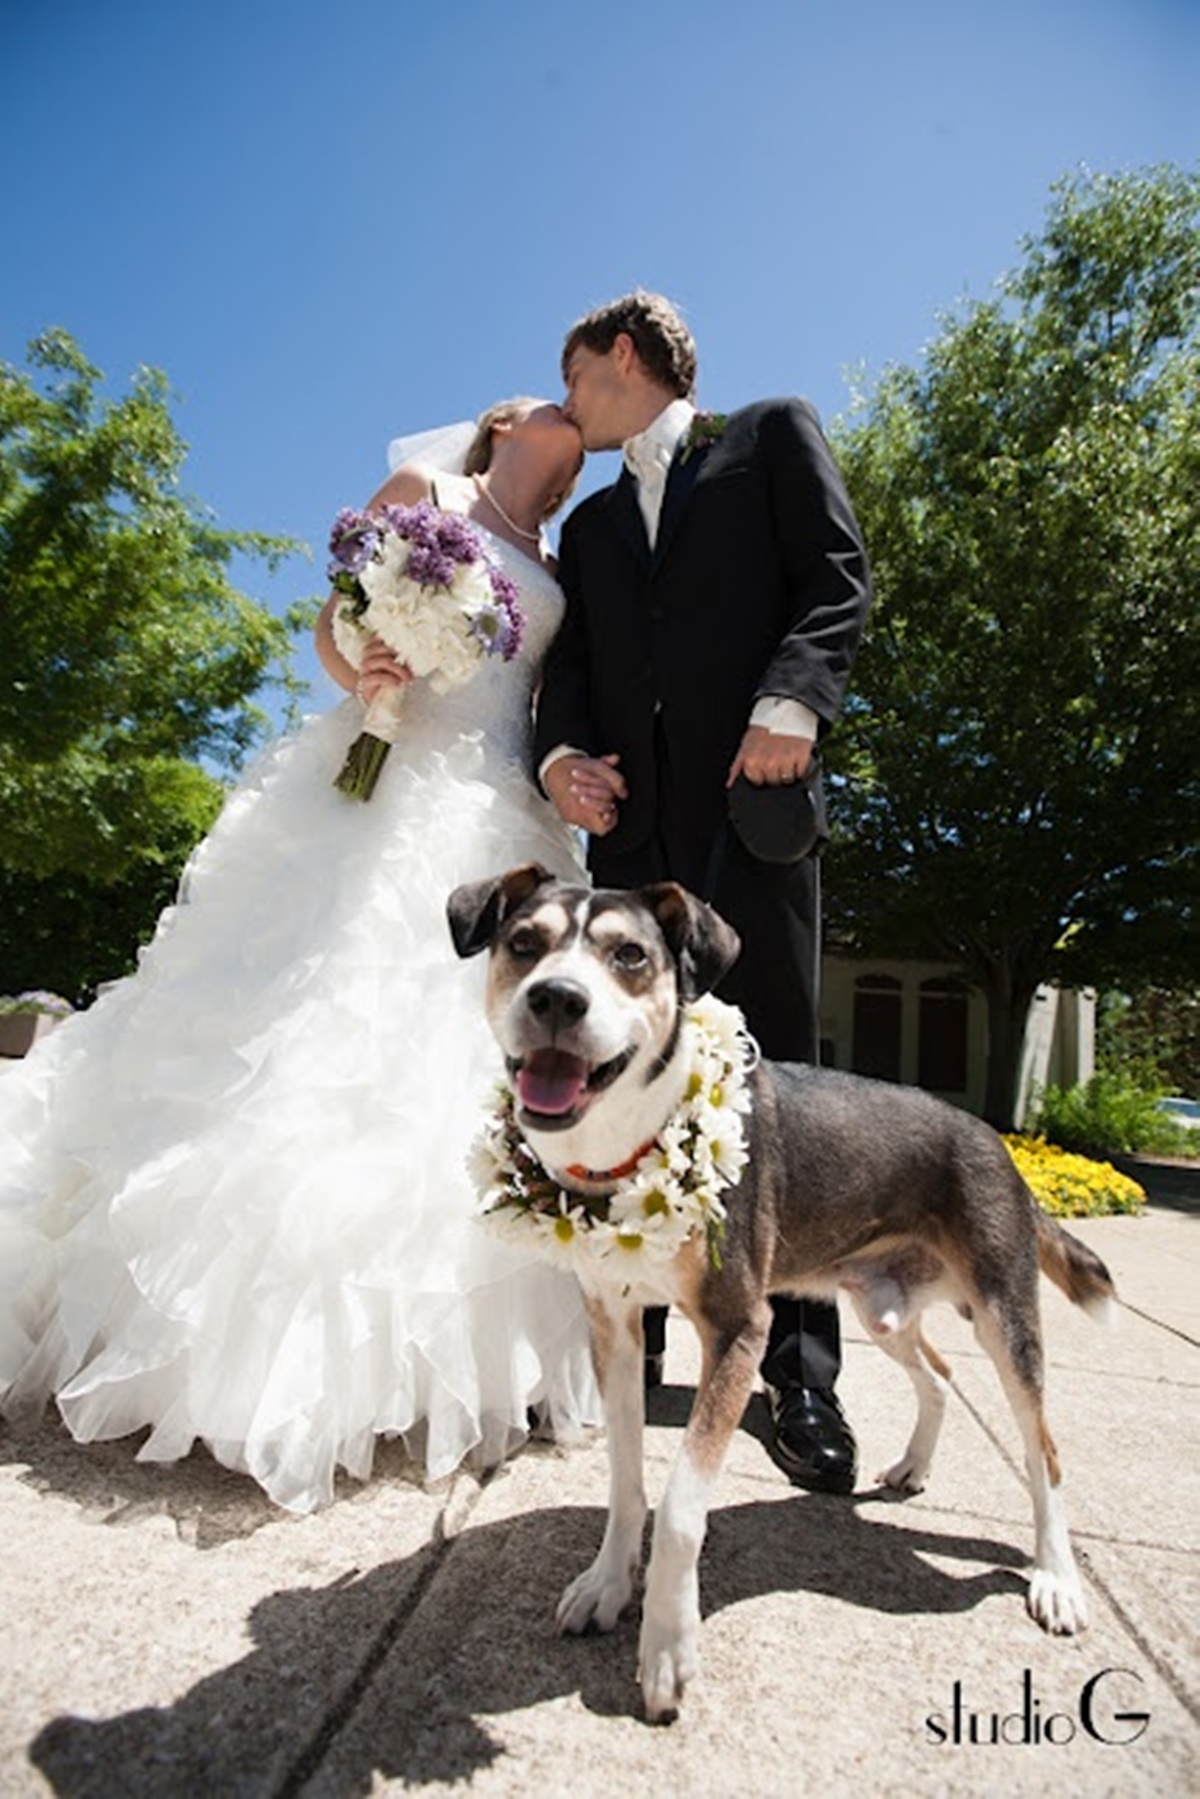 cani e matrimoni-cane che ride